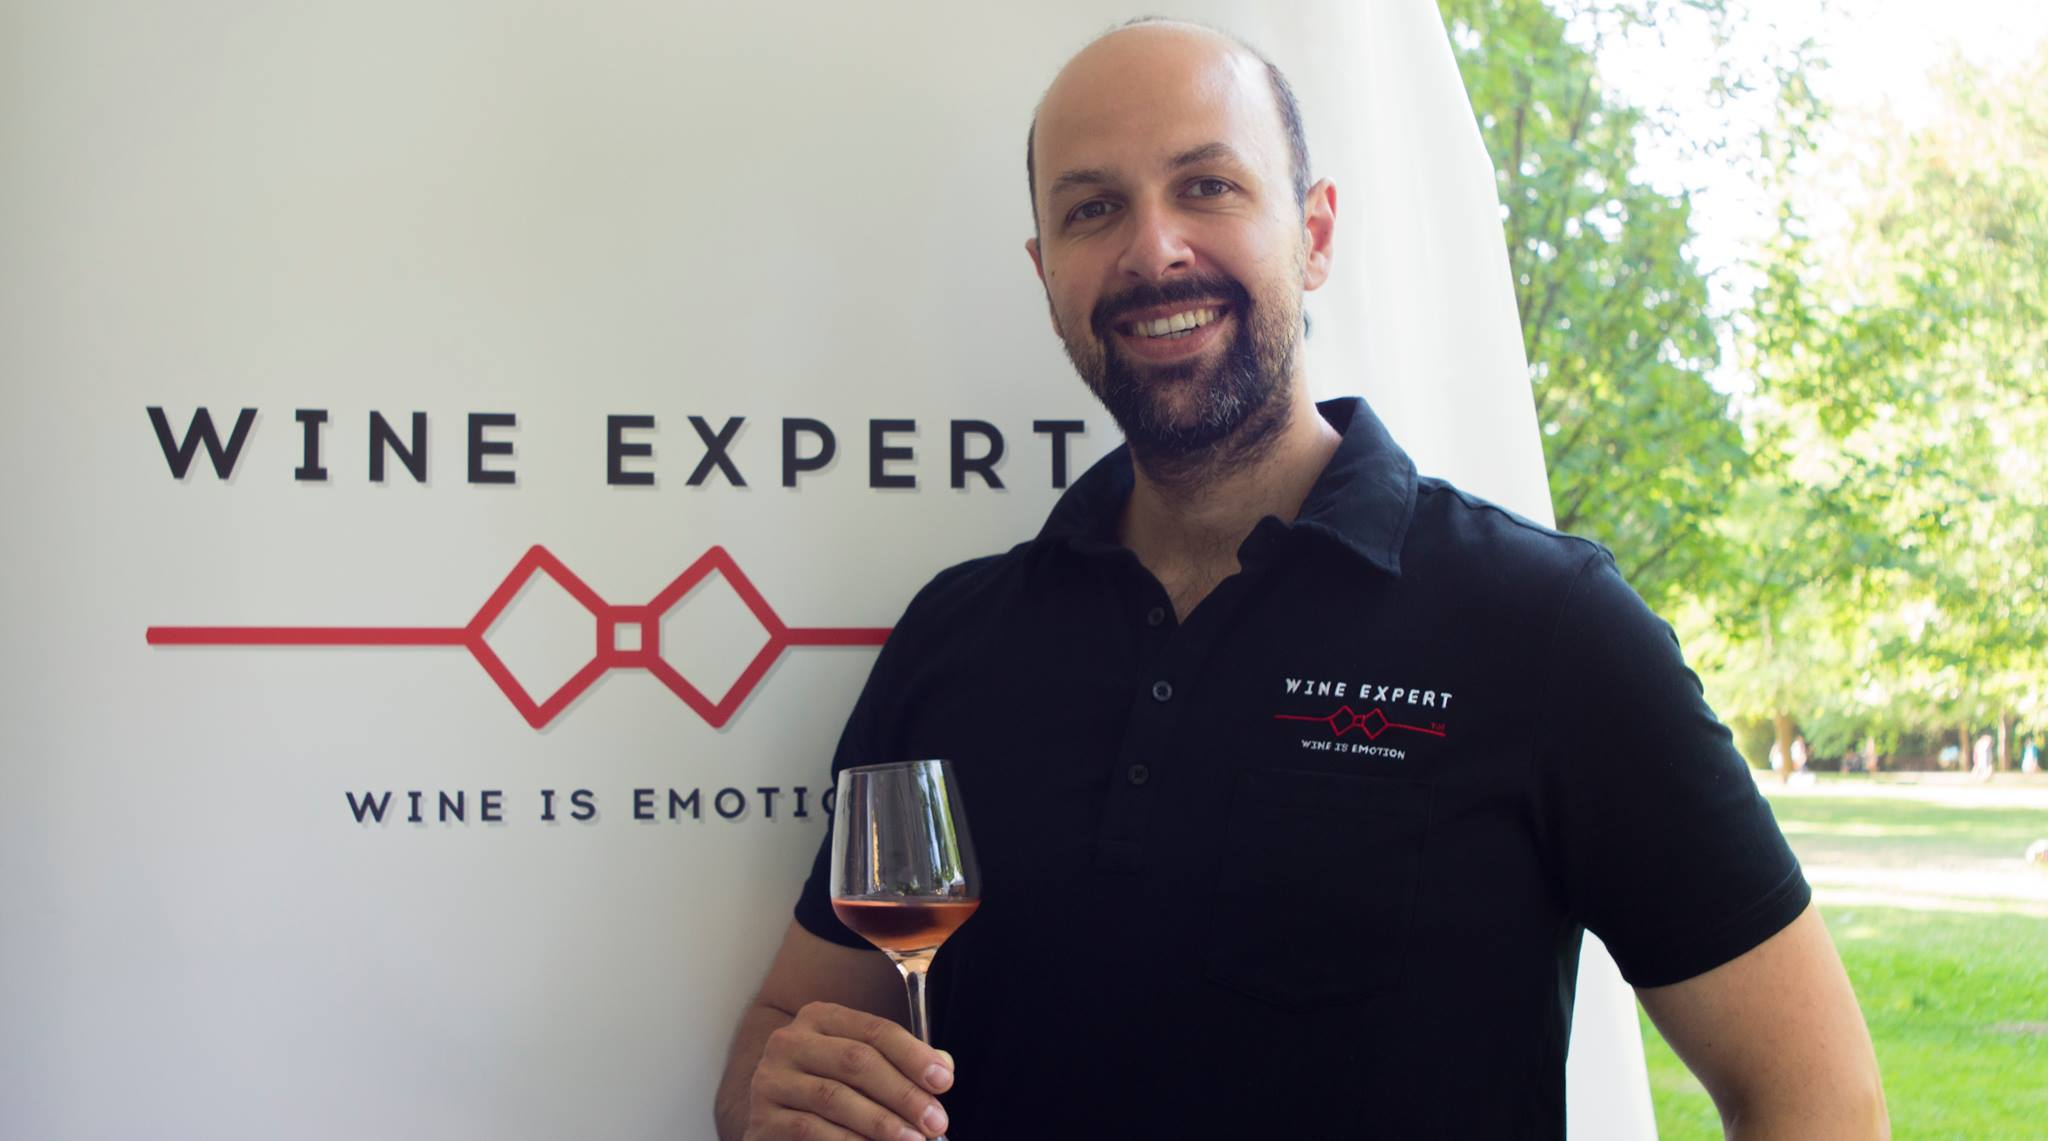 Tomáš Vyšvader - Wine Expert, s.r.o.